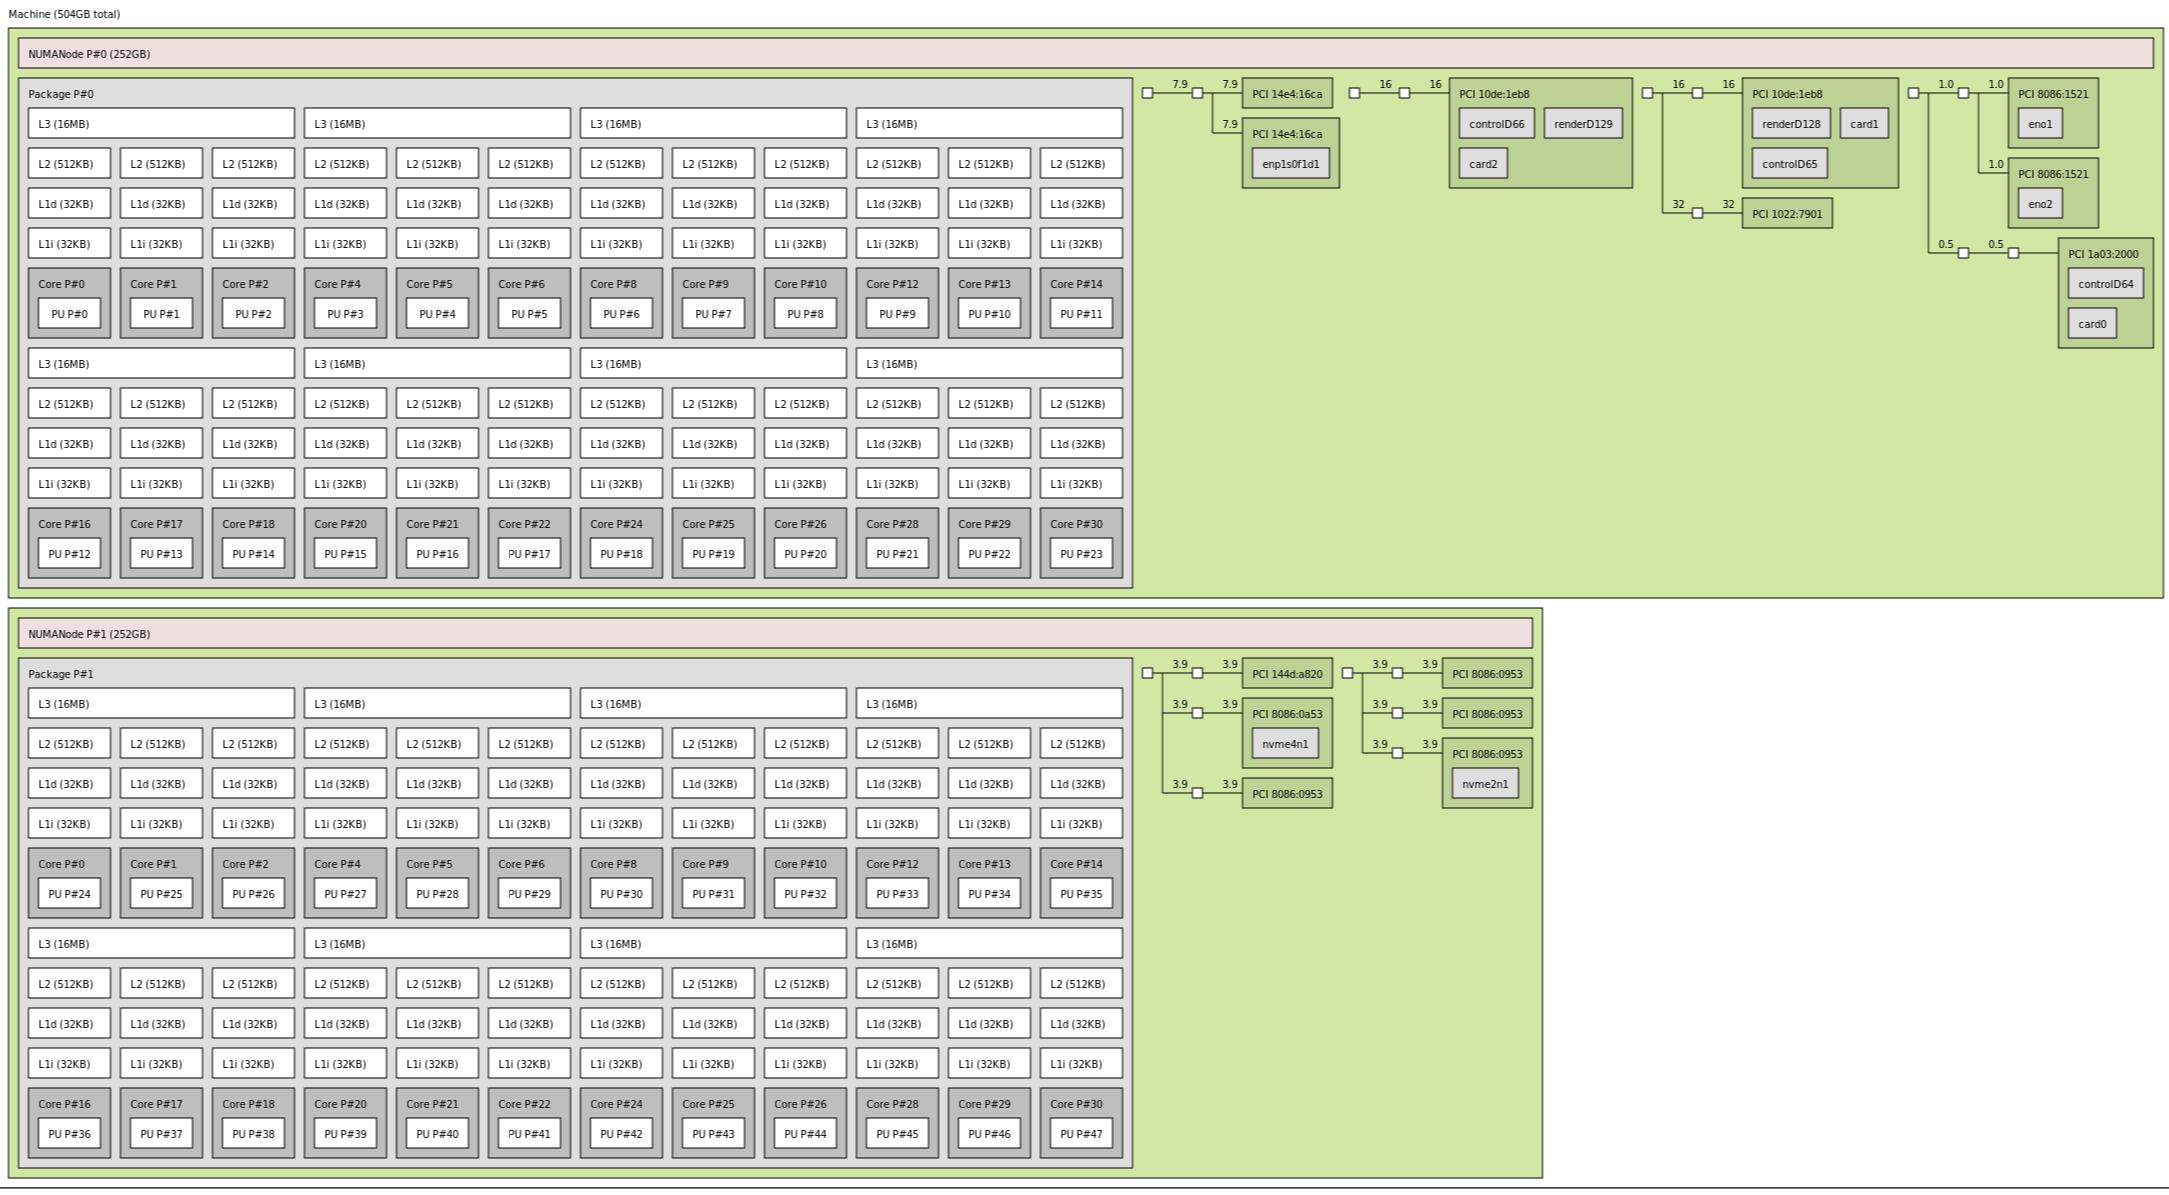 Gigabyte 2U EPYC 7402 Node With NVMe SSDs OCP 25GbE And 2x Tesla T4